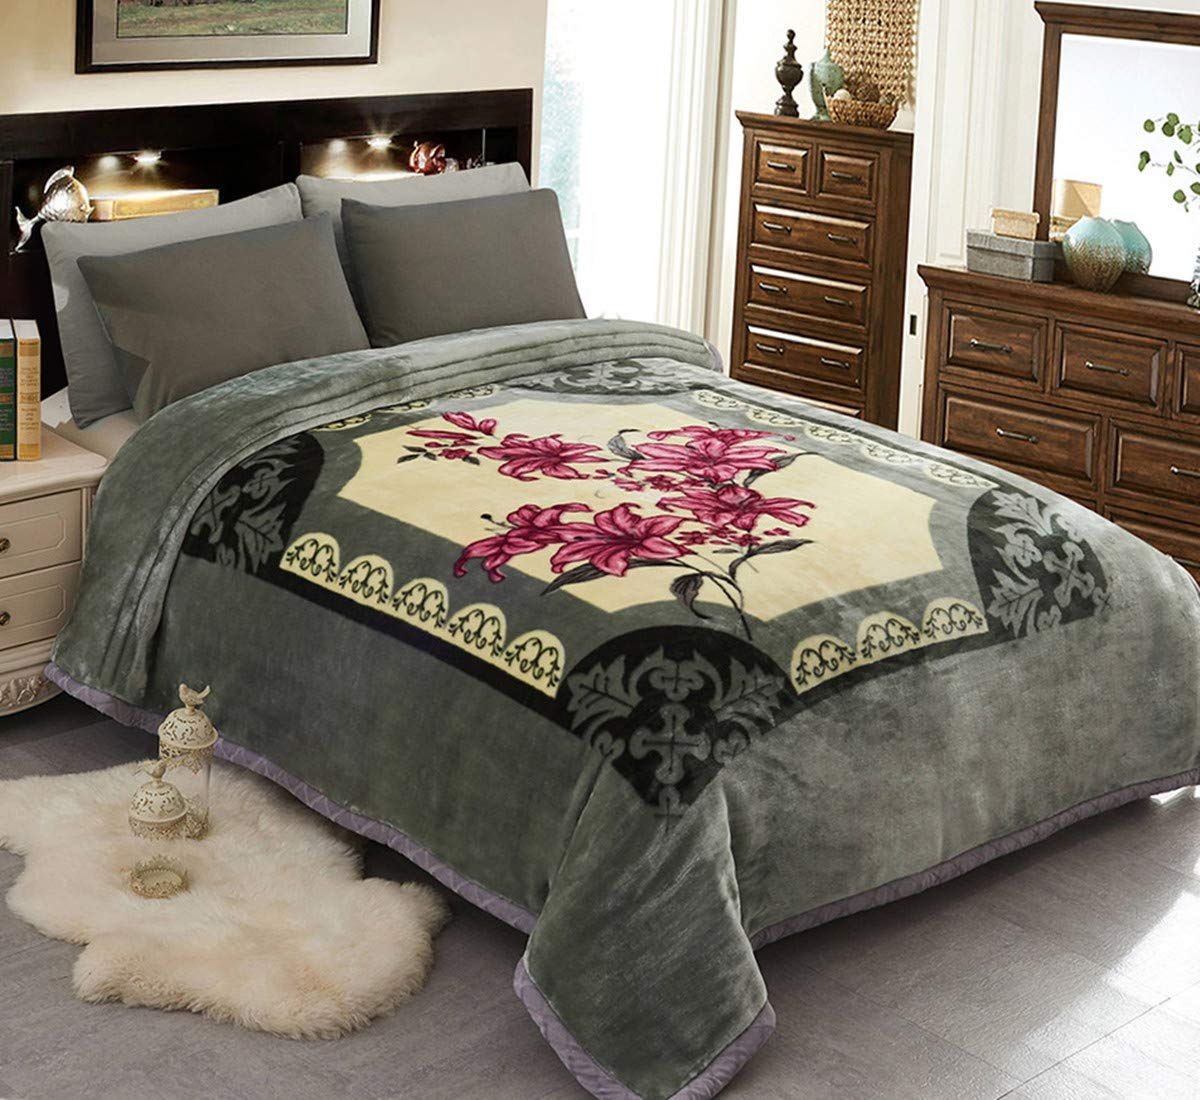 JML Fleece Blanket Pounds Korean